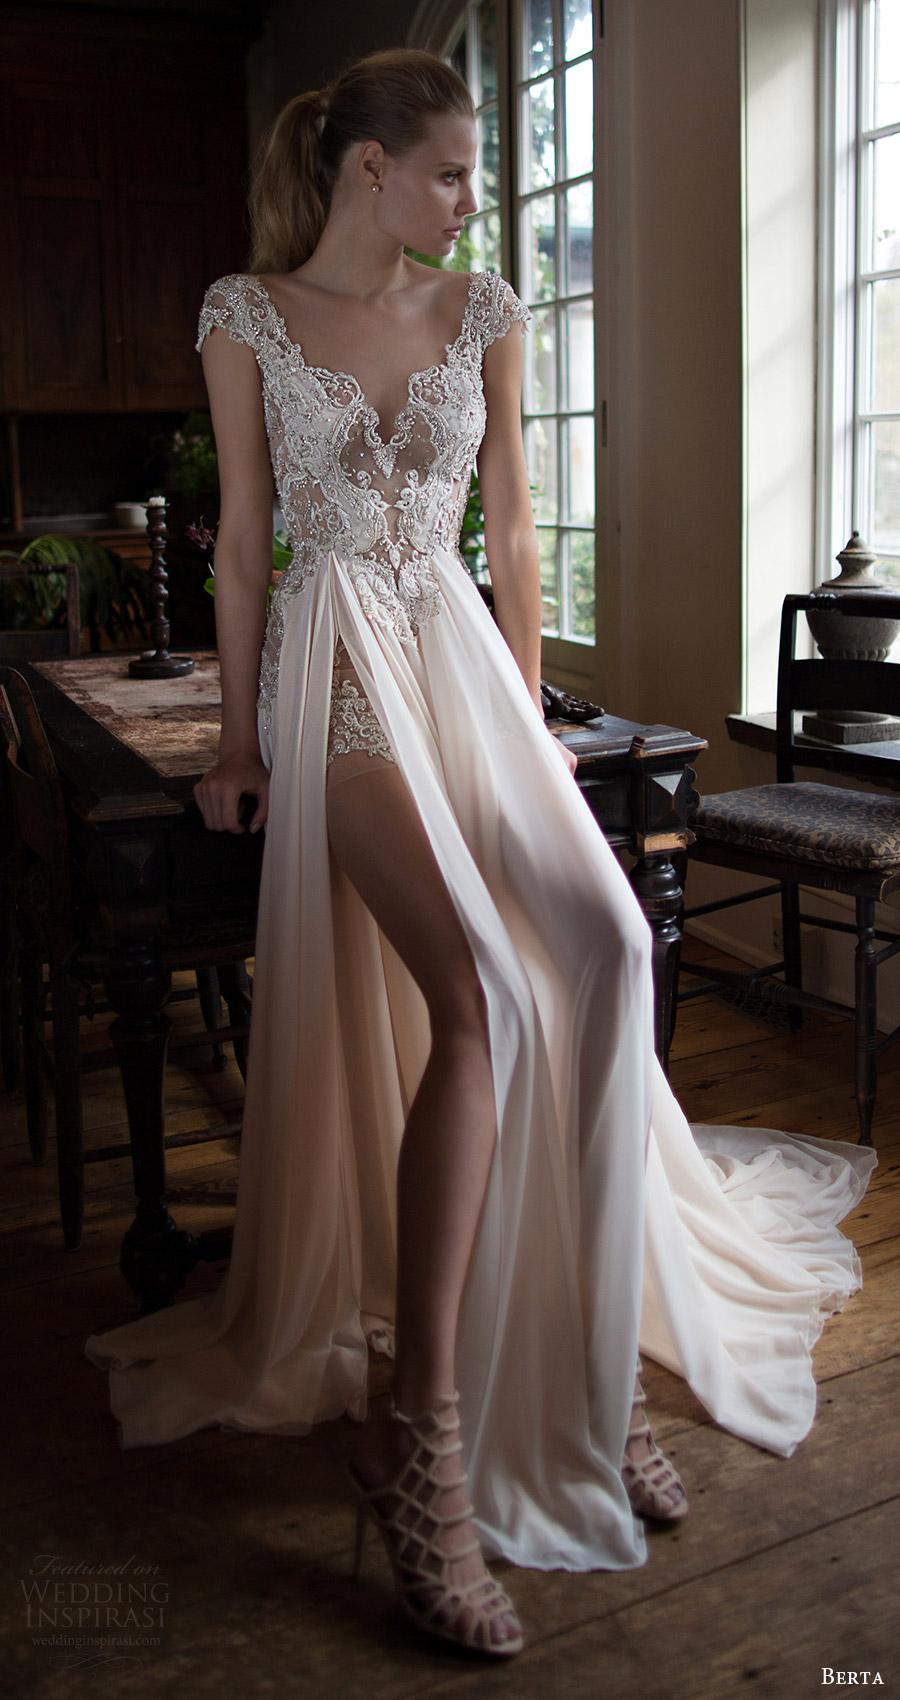 berta bridal fall 2016 cap sleeves sweetheart aline wedding dress slit skirt (16 115) mv